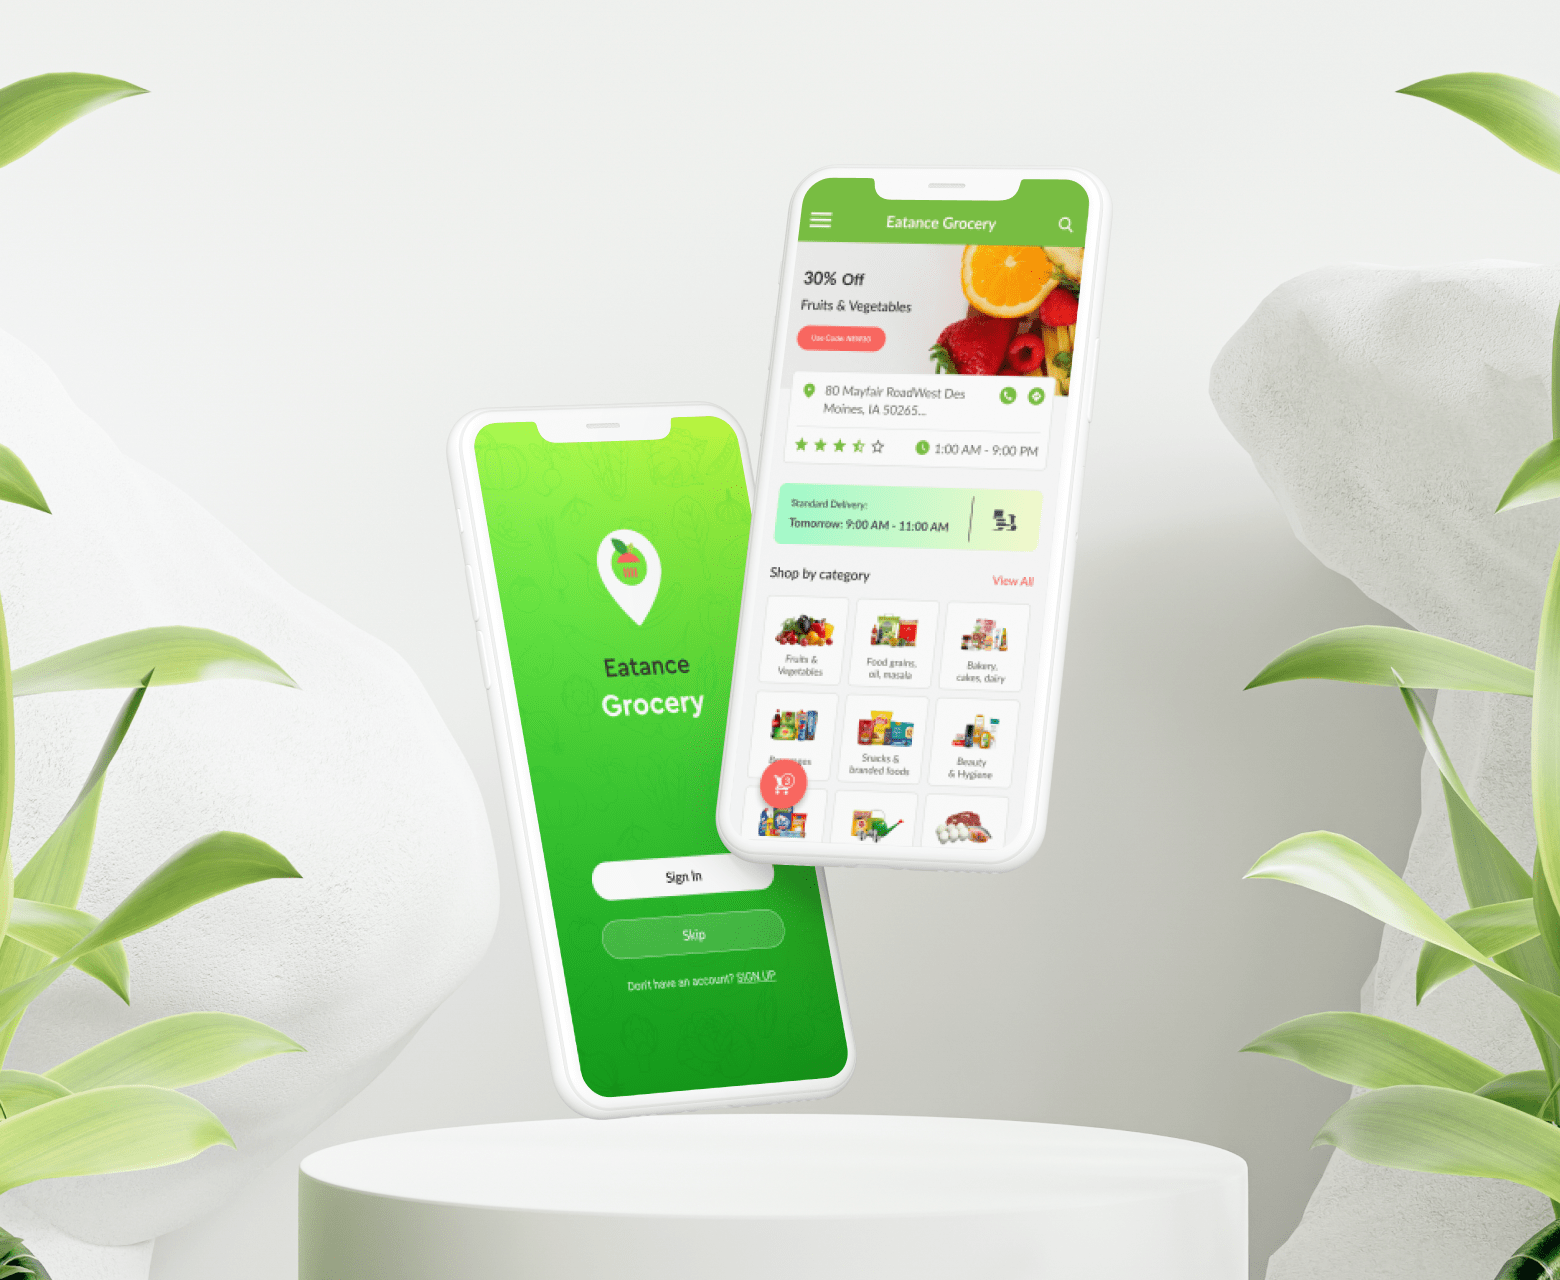 Eatance Grocery App